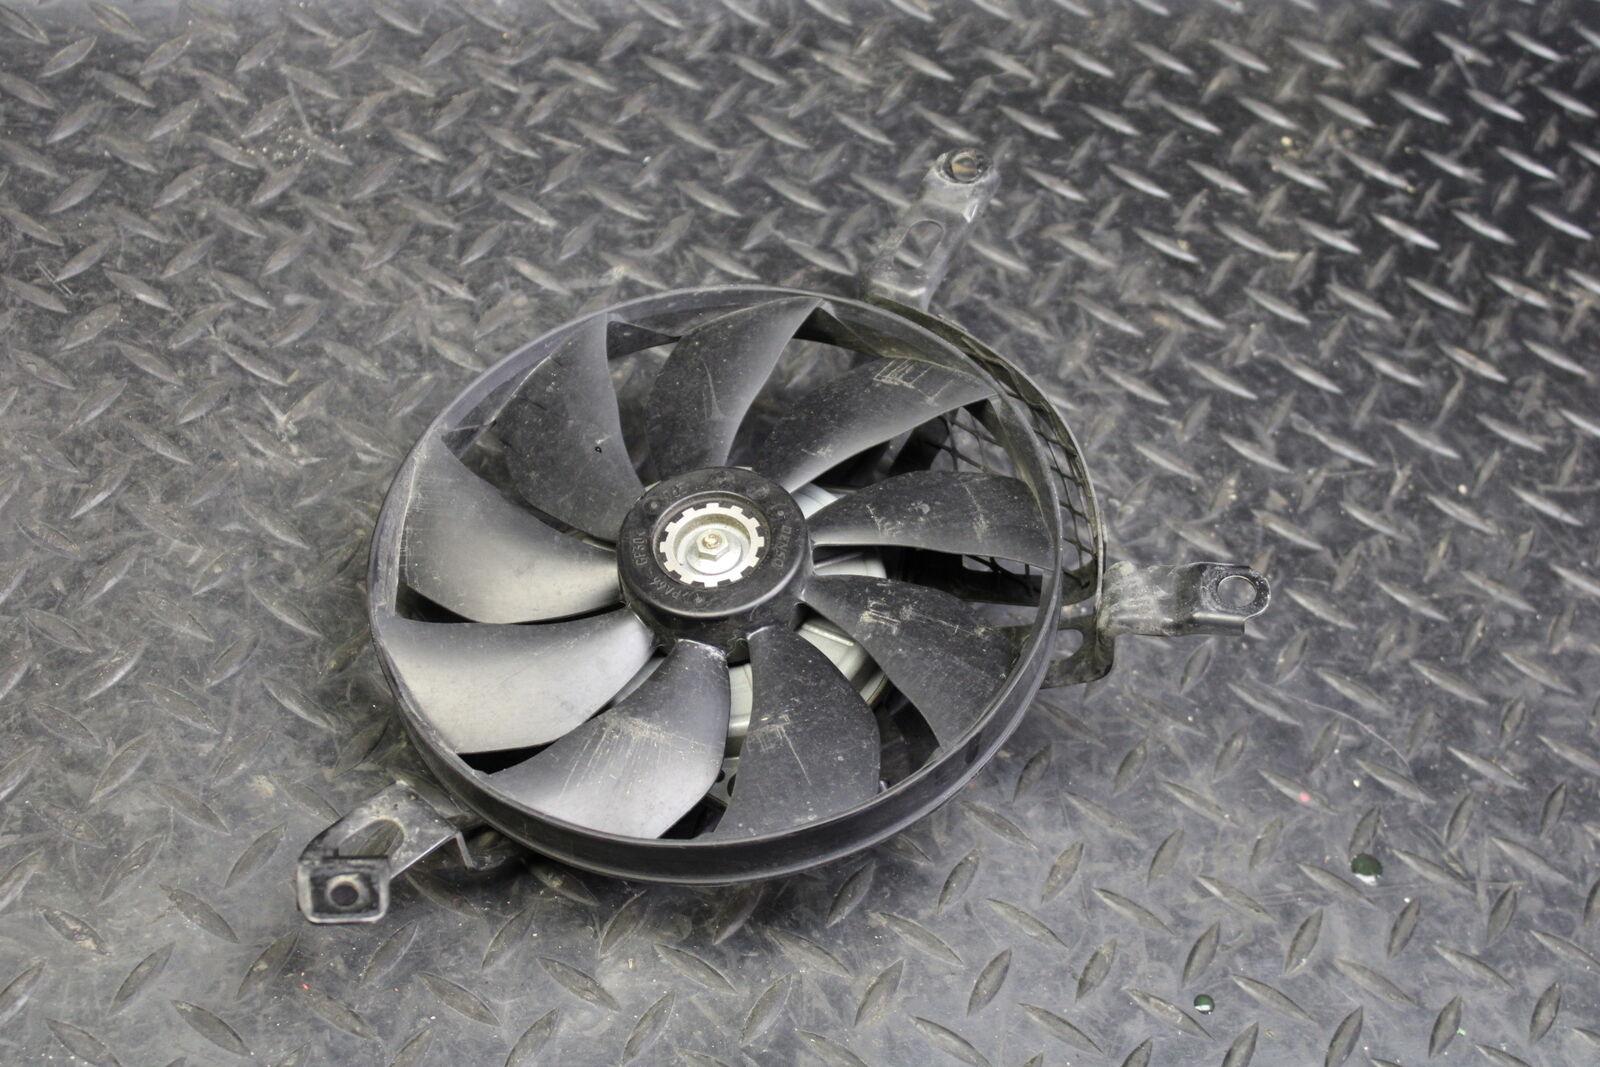 07 Suzuki Gsxr1000 Engine Radiator Cooling Fan 17800